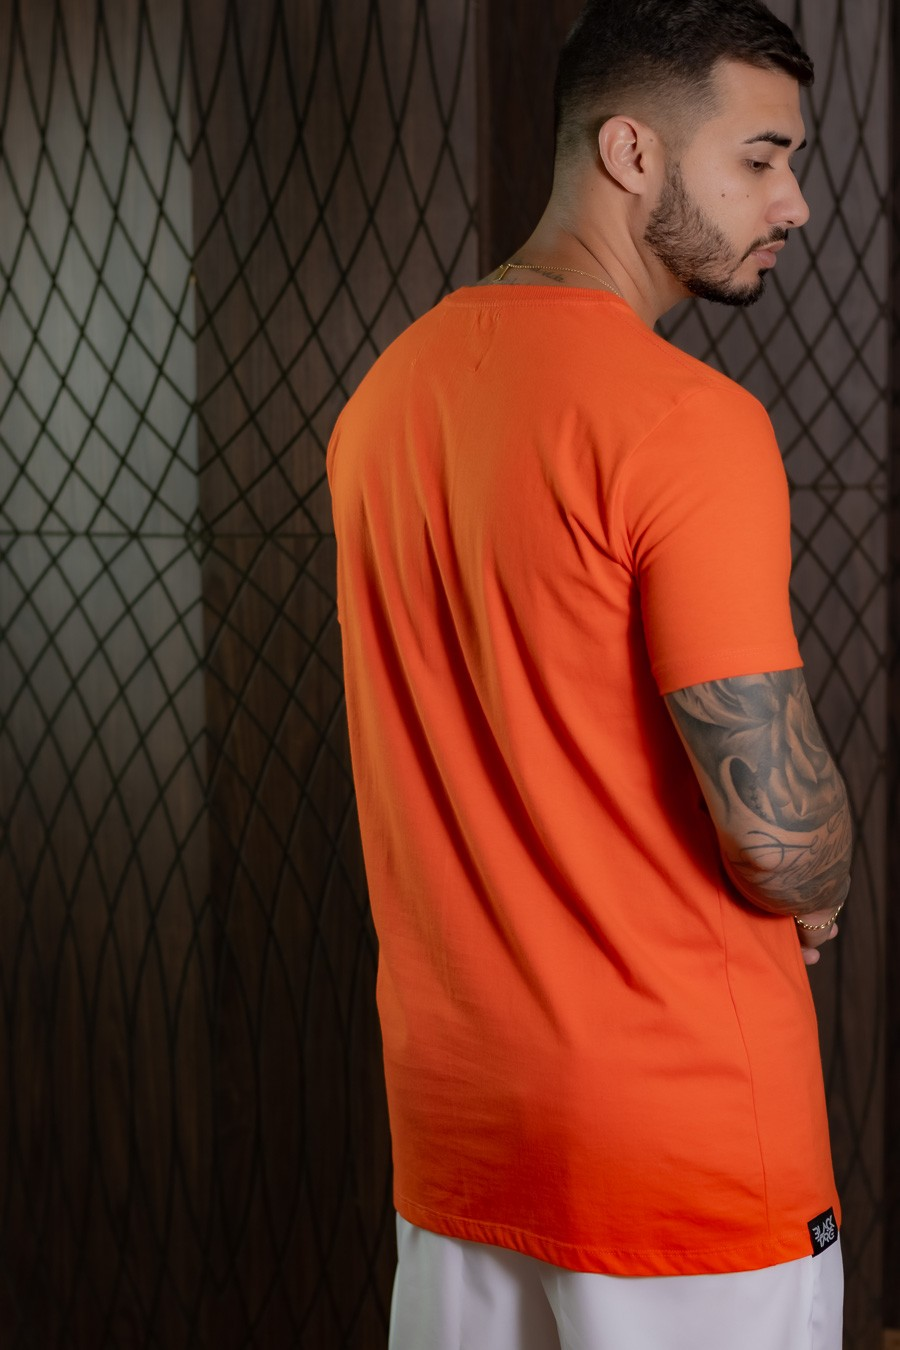 Camiseta Masculina Alaranjada